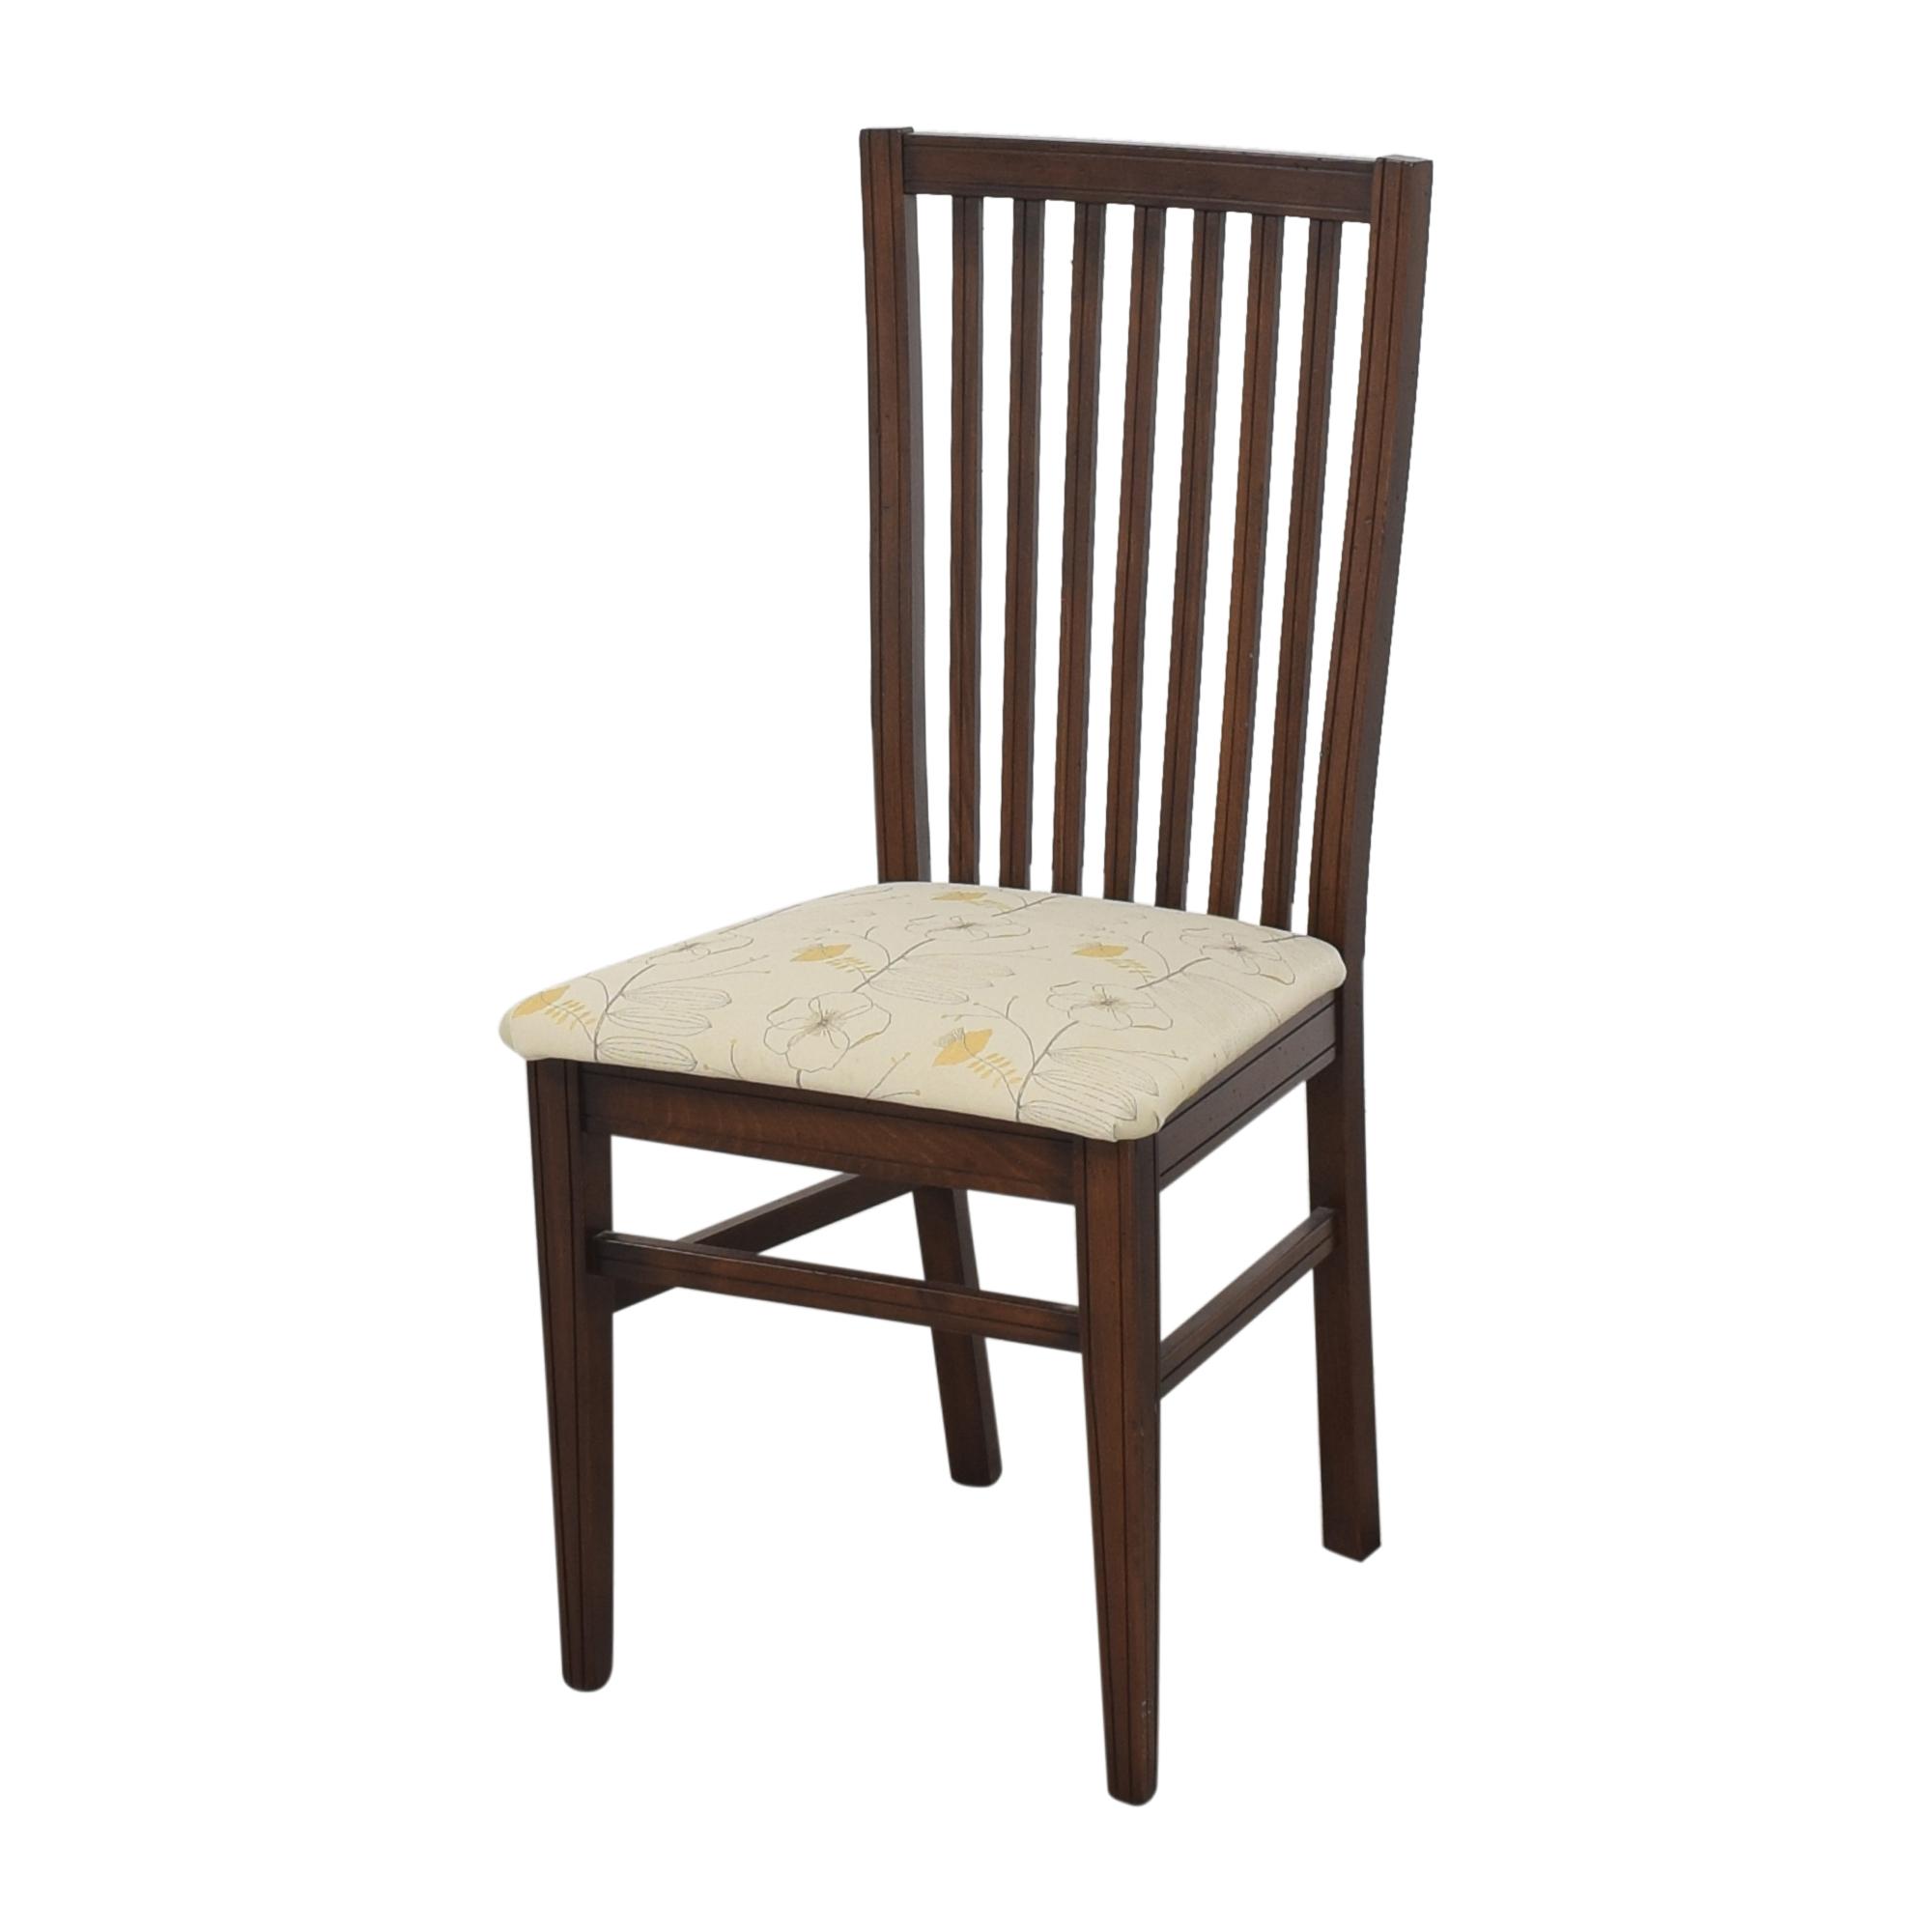 Arhaus Anna Dining Side Chairs sale